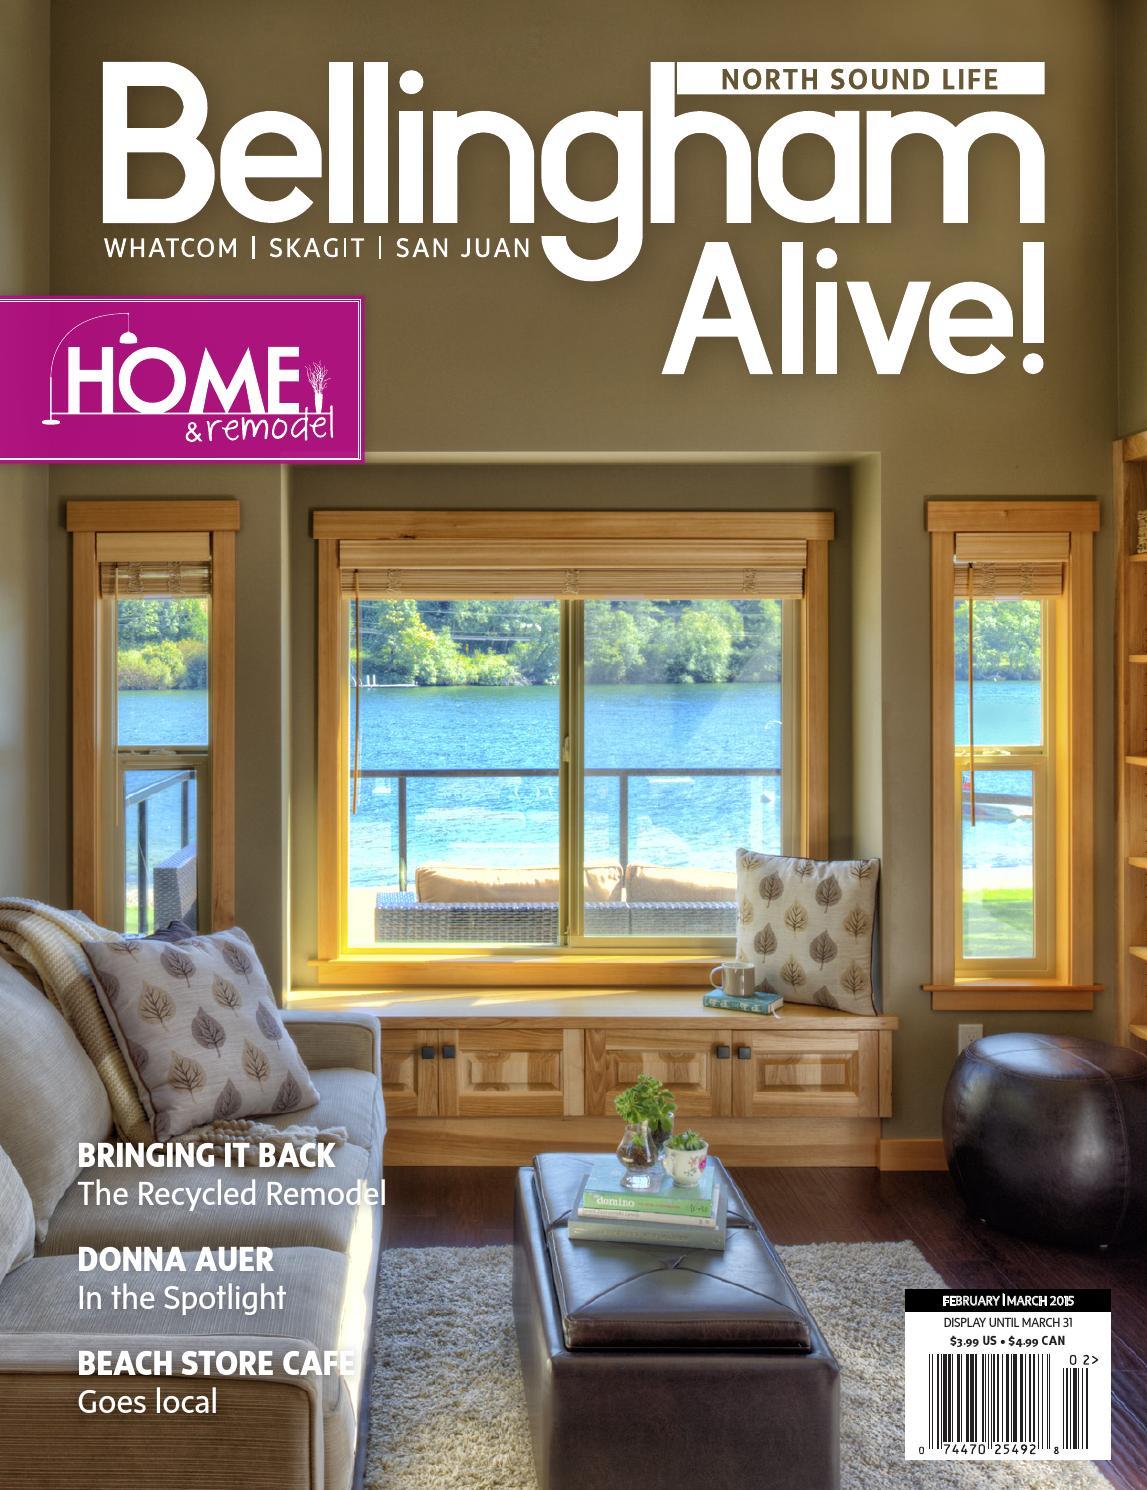 Feb mar 2015 bellingham alive north sound life by k l media issuu